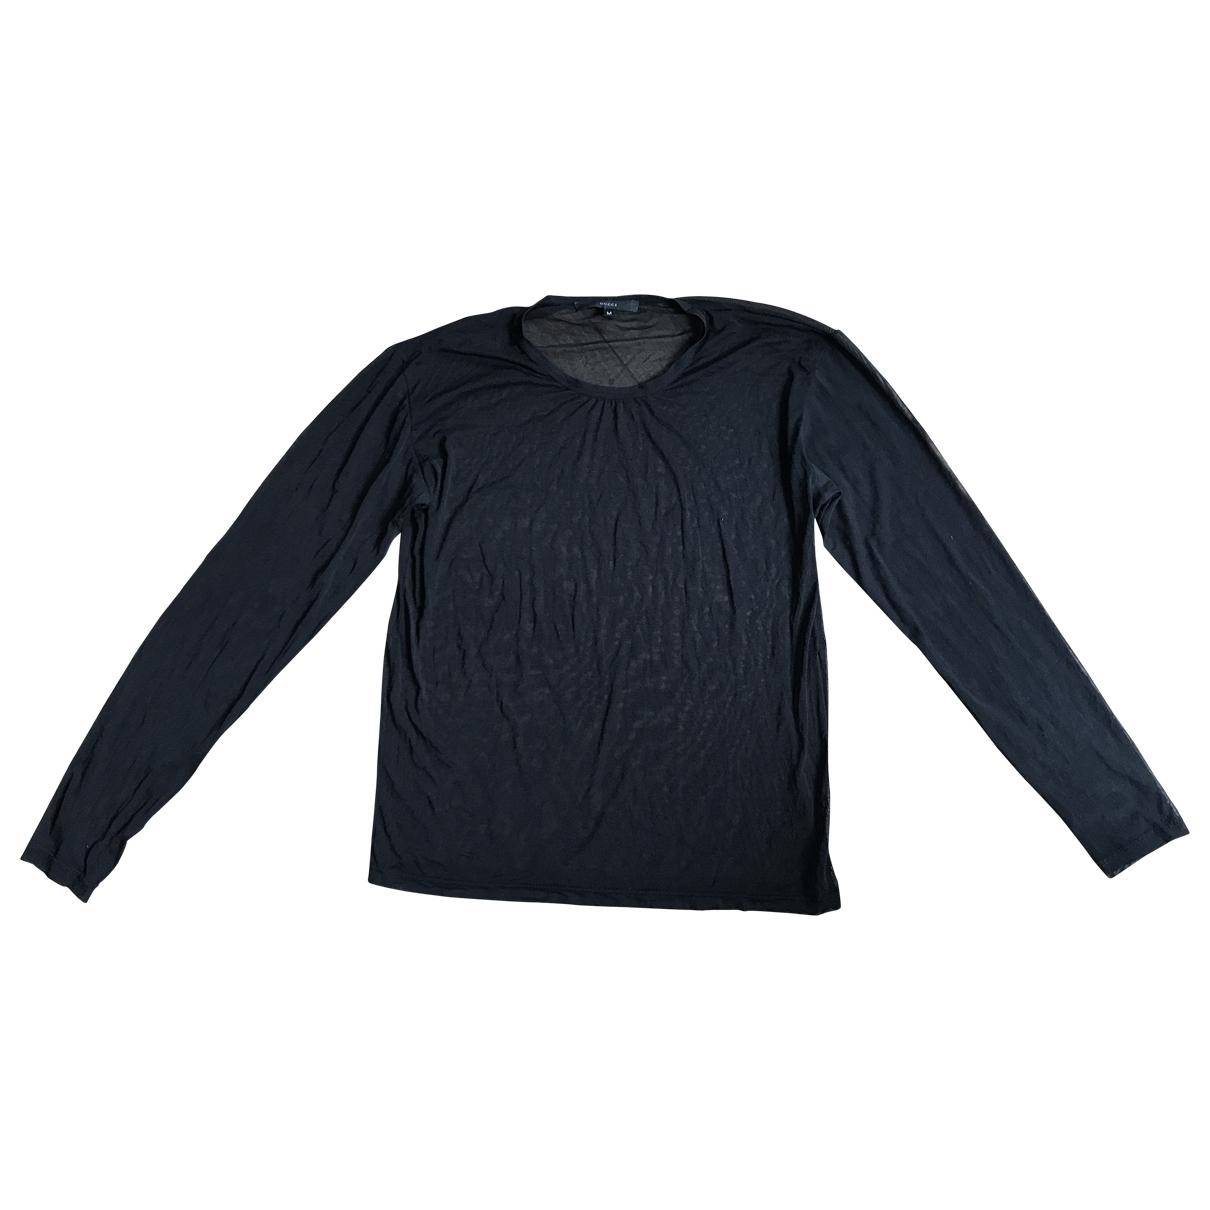 Gucci \N Black  top for Women 38 FR